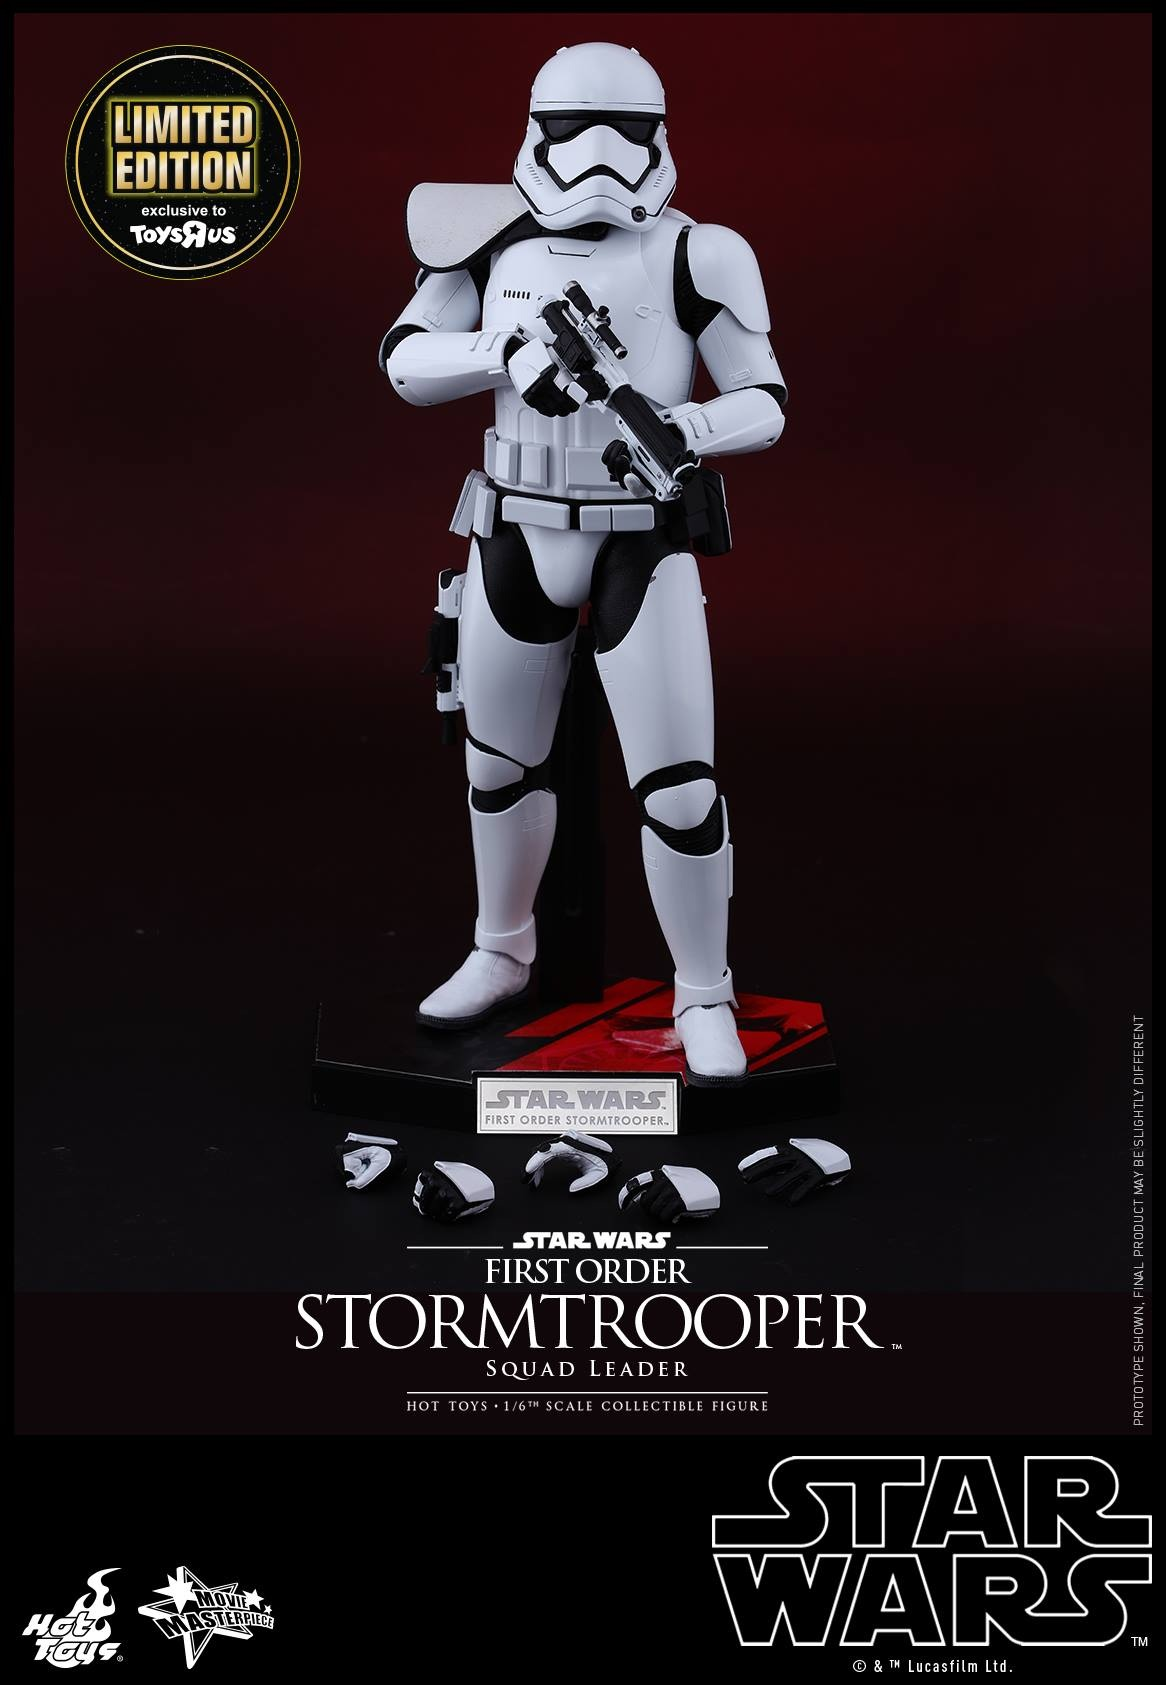 Hot Toys倾力制作星球大战第七步曲《星球大战7:原力觉醒》全球首个First Order Stormtrooper Squad Leader 1/6比例珍藏人偶 (TRU Exclusive版本),现在正式于香港尖沙咀海运大厦玩具反斗城「Star Wars Force Friday」午夜首卖派对独家现货发售,限量仅300个! 风靡全球的传奇科幻电影《星球大战:原力觉醒》,将于12月经典回归!为了让粉丝们抢先体验原力的强大威力, Hot Toys倾力製作星球大战第七步曲《星球大战:原力觉醒》全球首个F